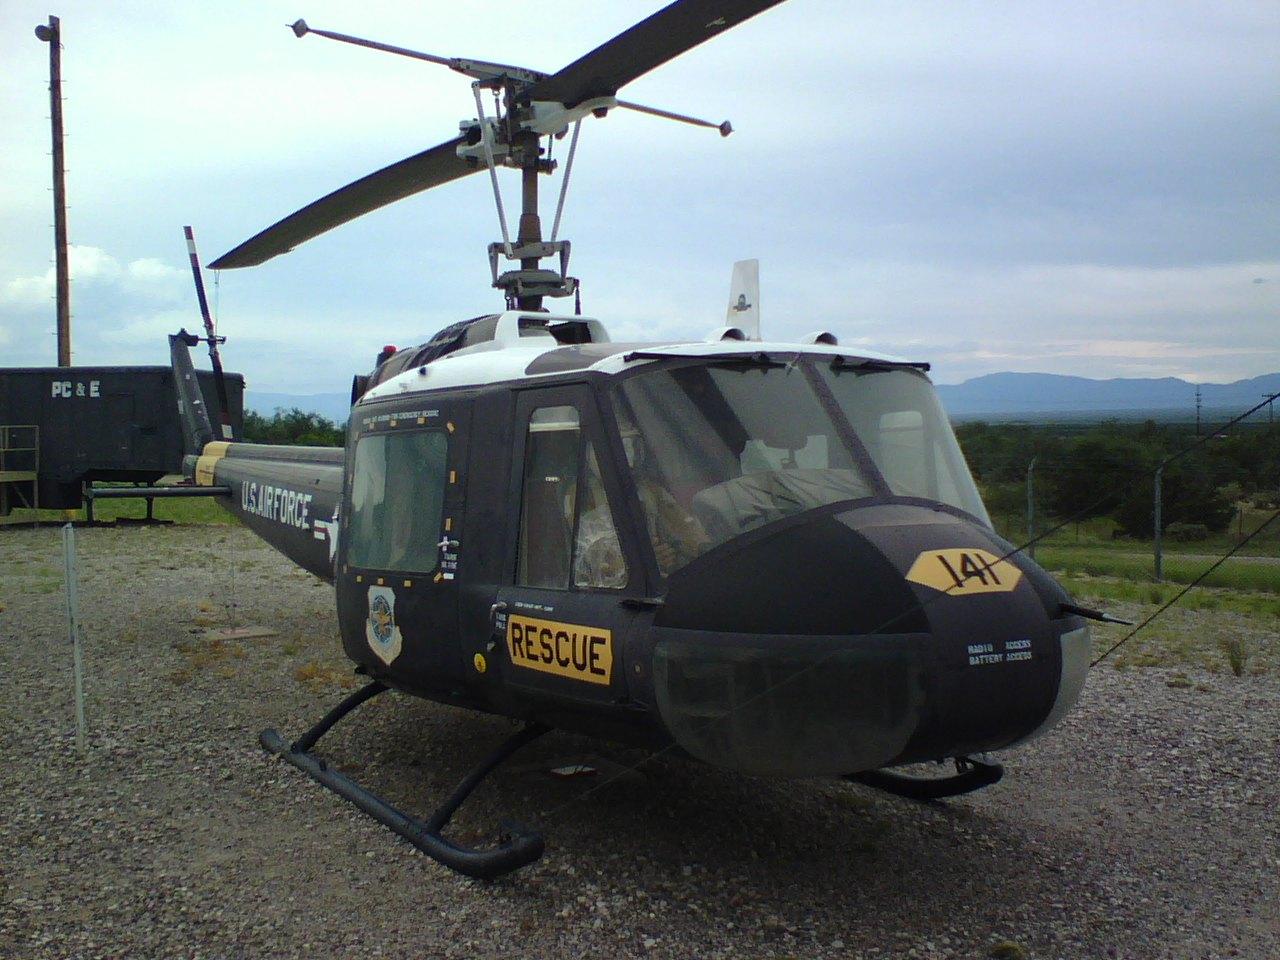 UH-1 Huey - UH-1 Huey at the Titan Missile Museum.